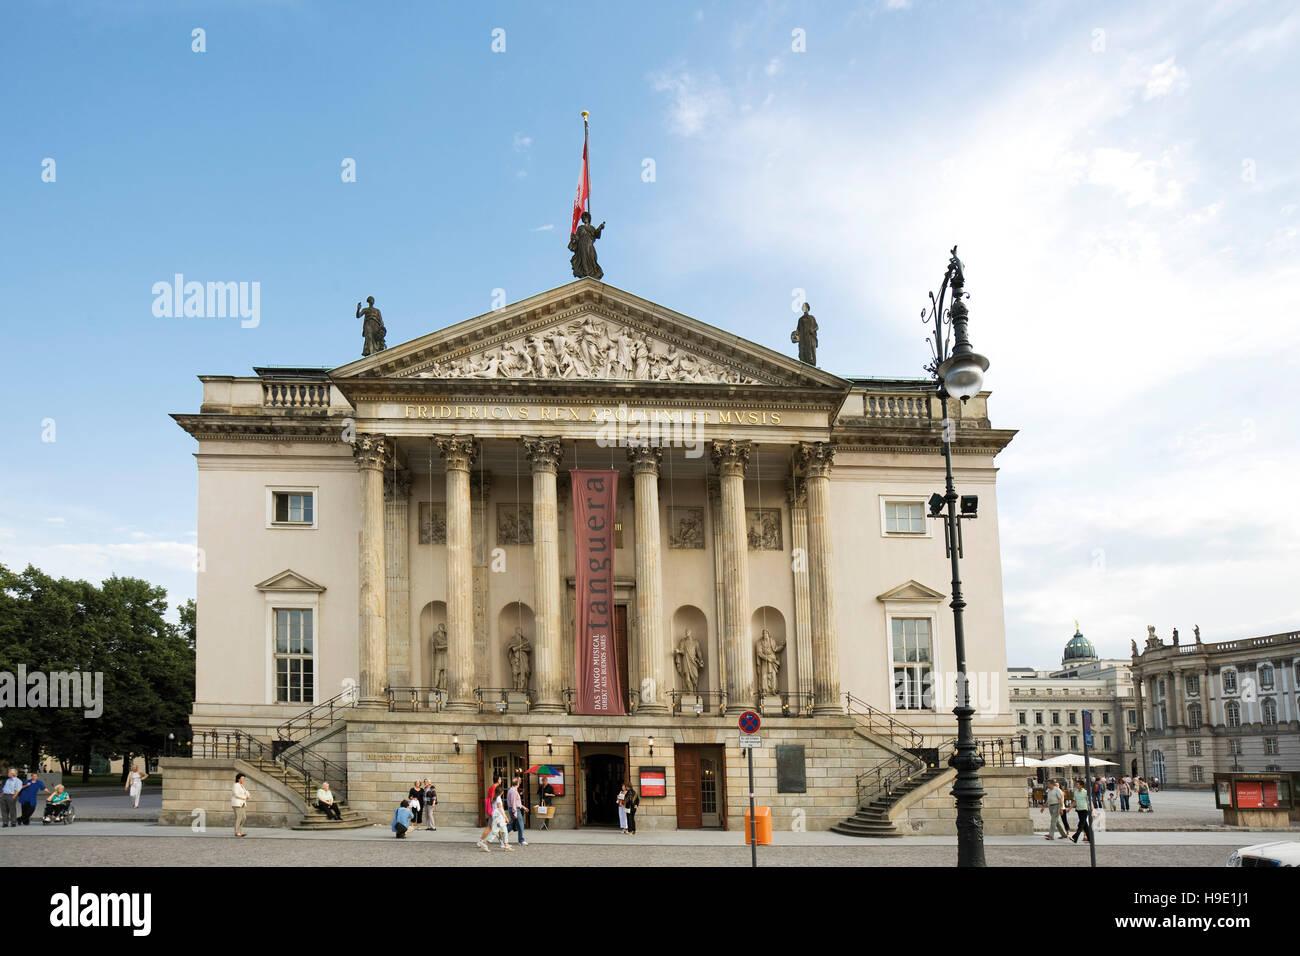 State Opera House Berlin Stock Photos & State Opera House ...